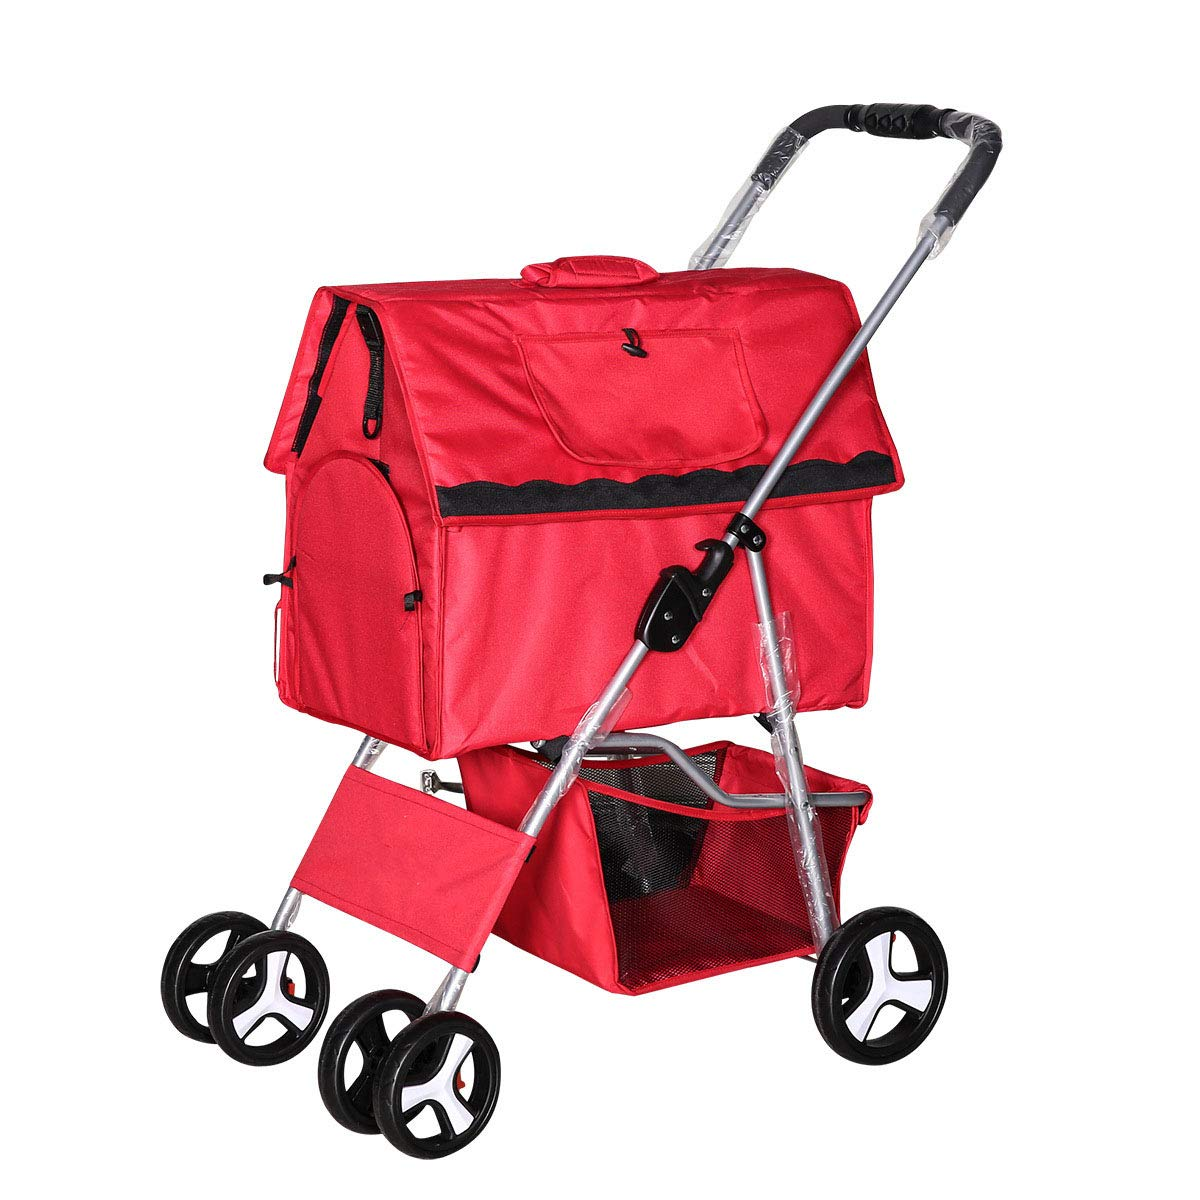 Pet Stroller Foldable Removable and Washable Split Dog Stroller Carrying Bag Teddy Kennel Pet House,Red